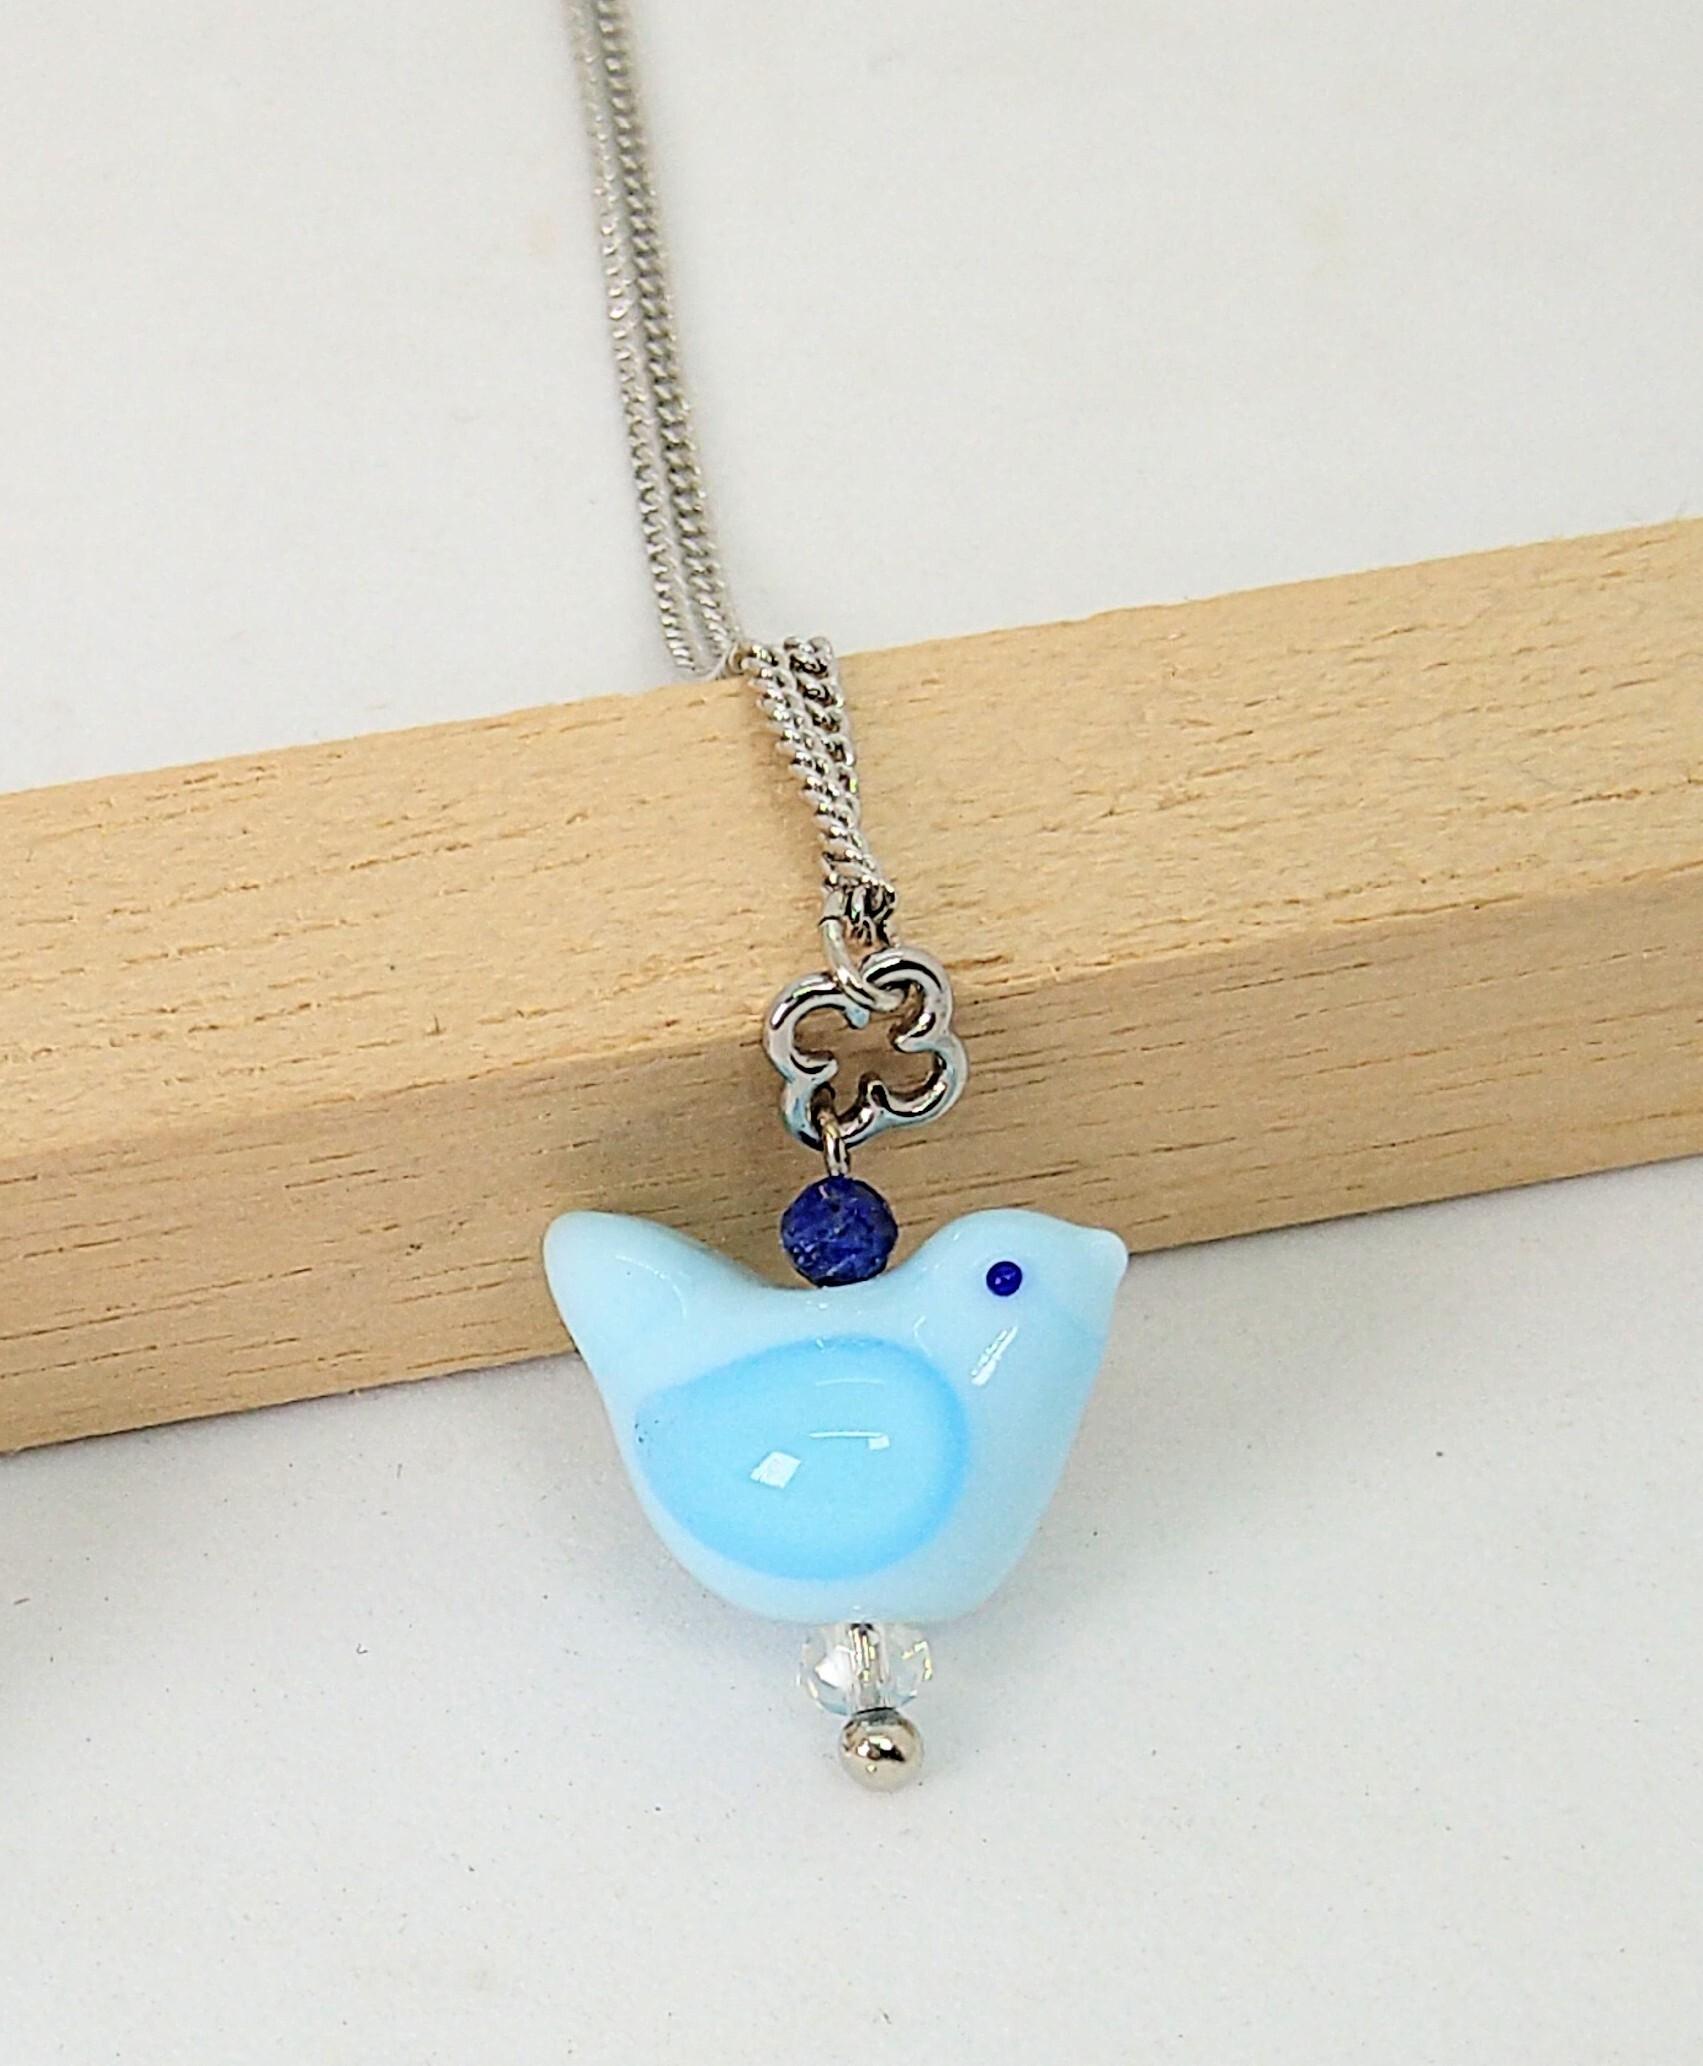 【mami】パステルブルーの小鳥とラピスラズリのネックレス